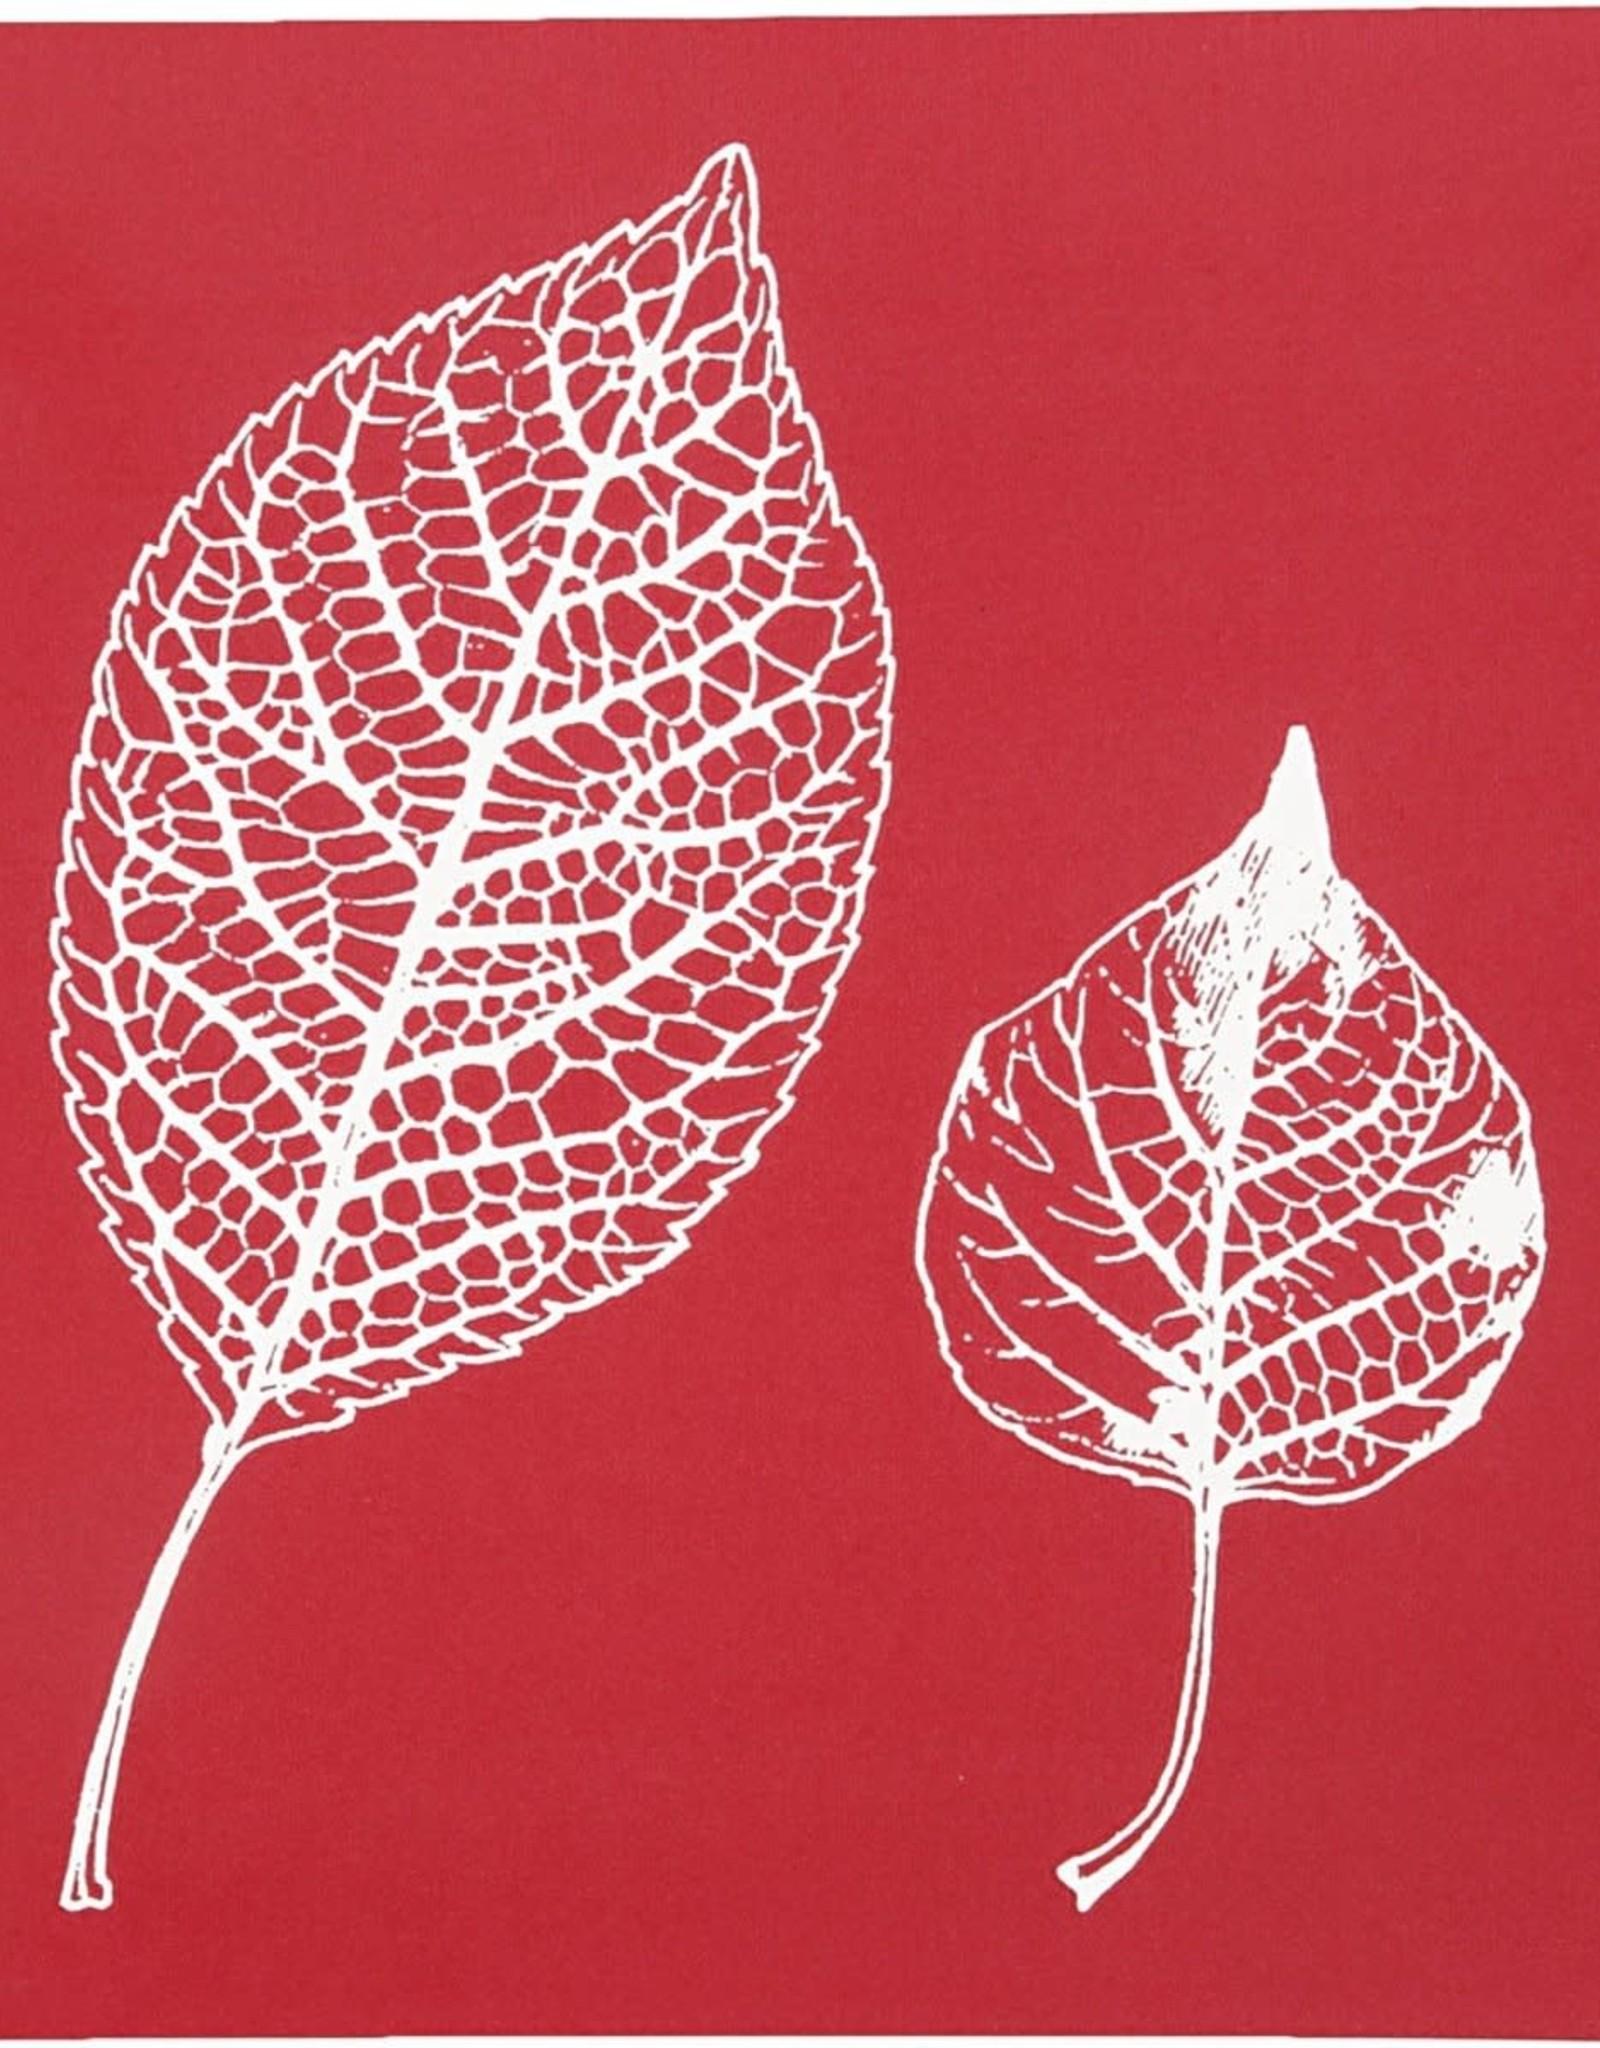 Stencil / Screen Leaves